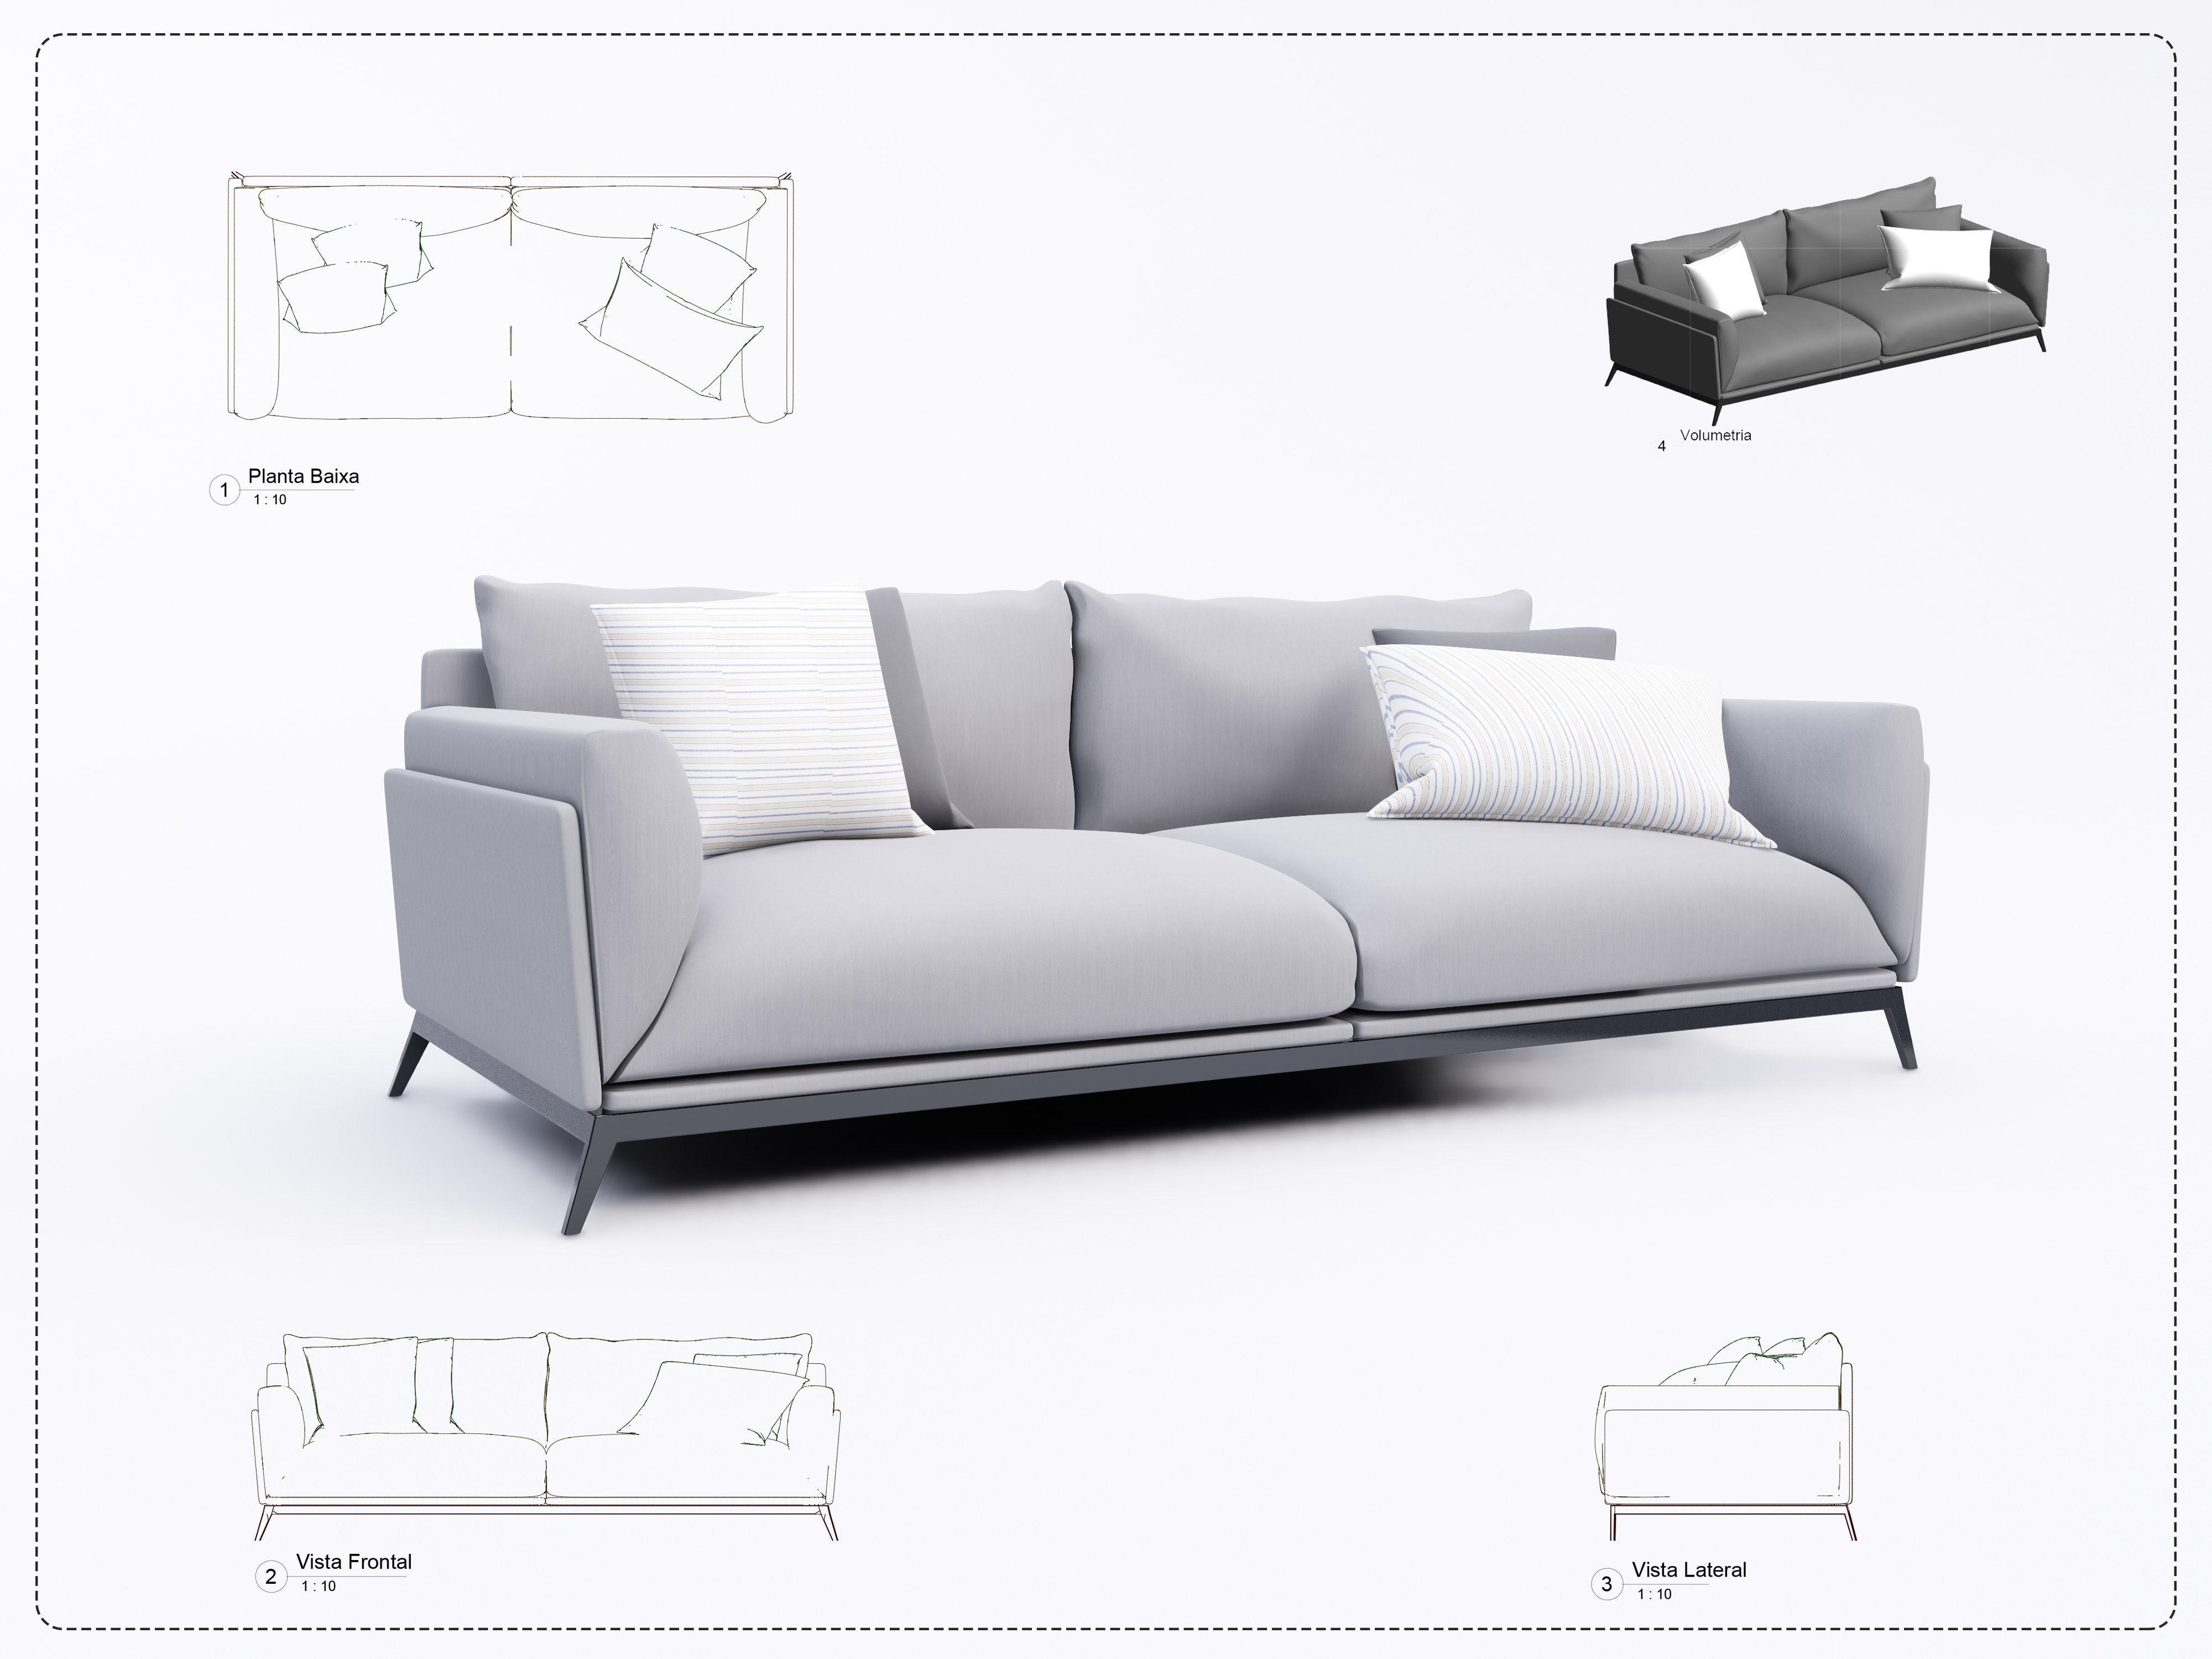 sofa revit high quality  3d models modern  cgtrader